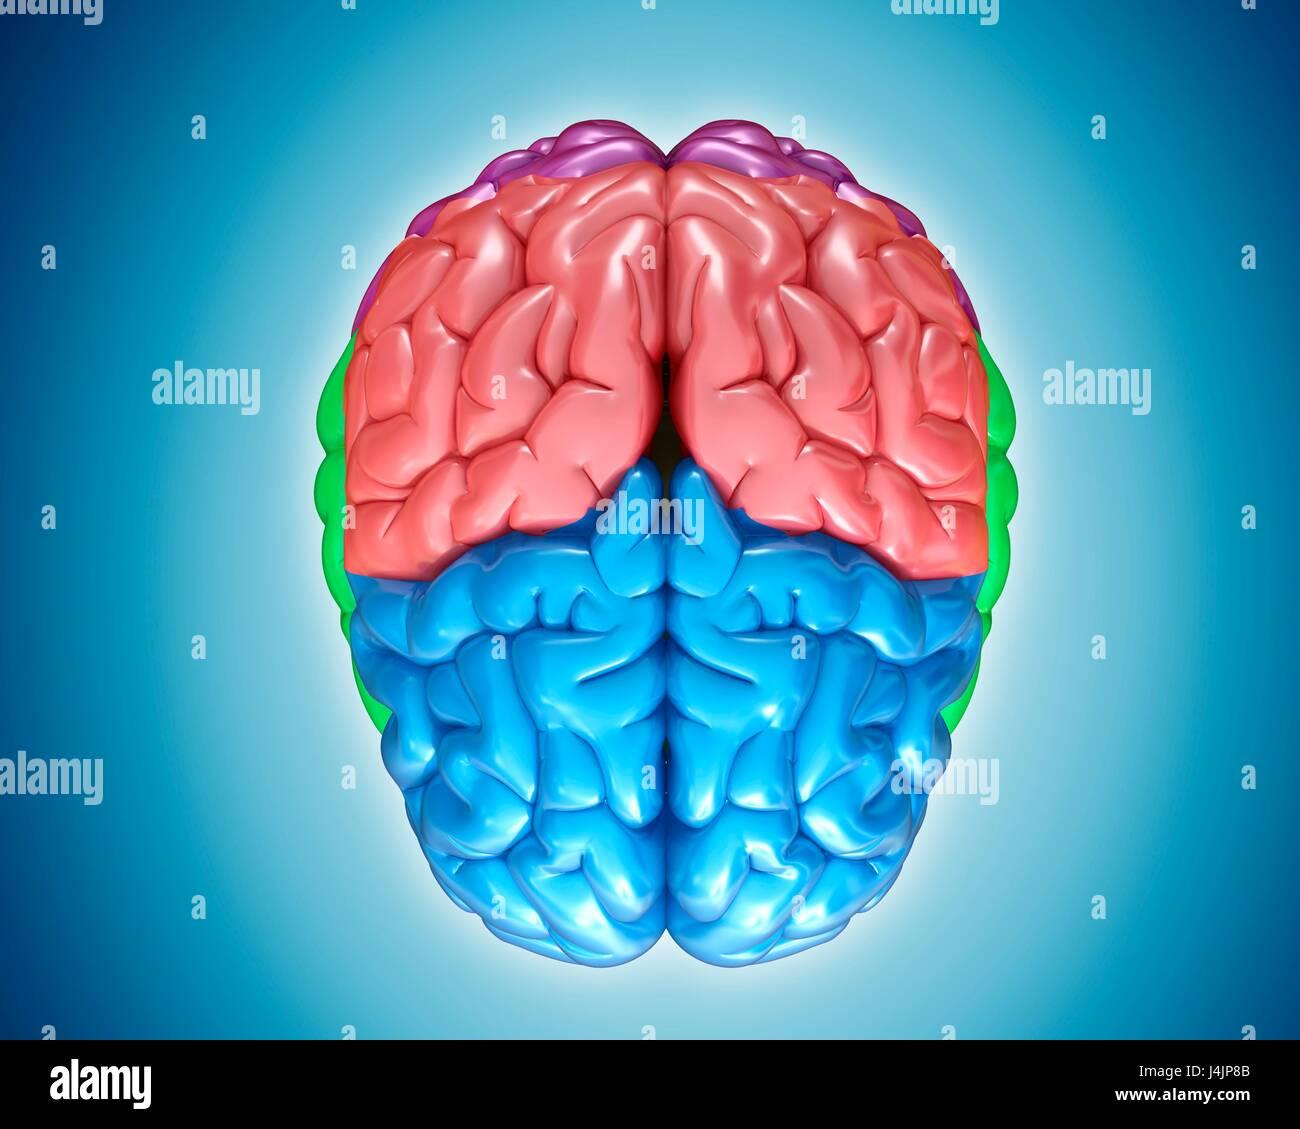 Illustration Of Human Brain Anatomy Stock Photo 140554187 Alamy